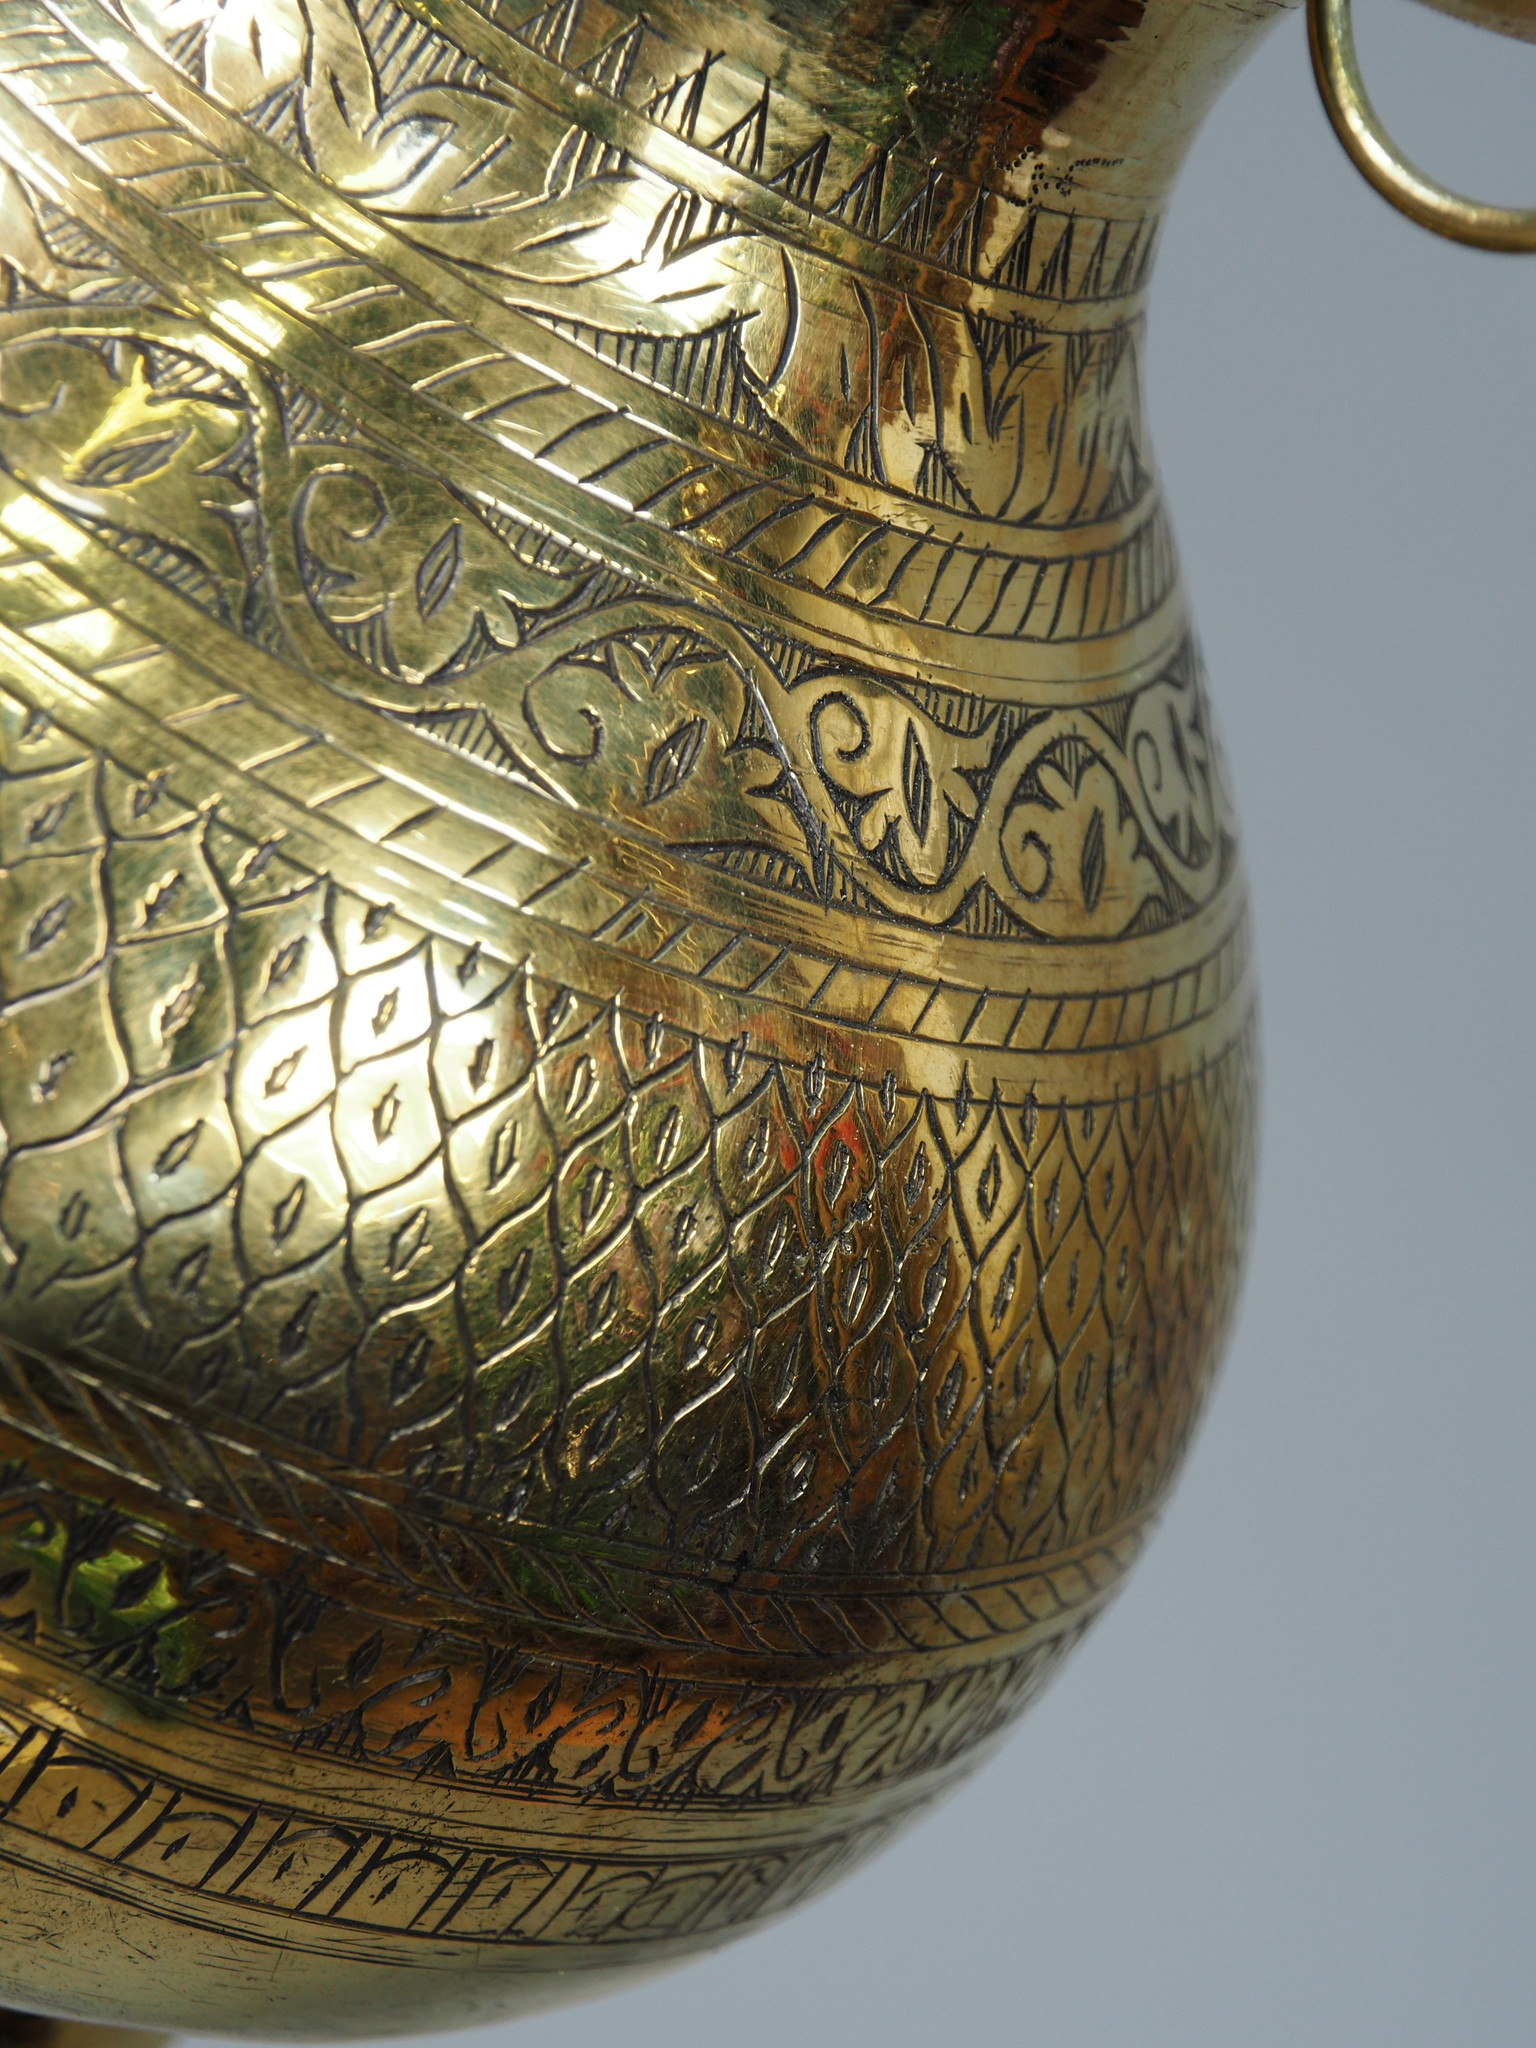 2 Liter antik orient Massiv Messing Ayurveda Shirodhara Stirnguss Stirnölguss öl-Therapie Panchakarma Yoga Dhara Vessel gefäß -Nr: 21/ 14 - Copy - Copy